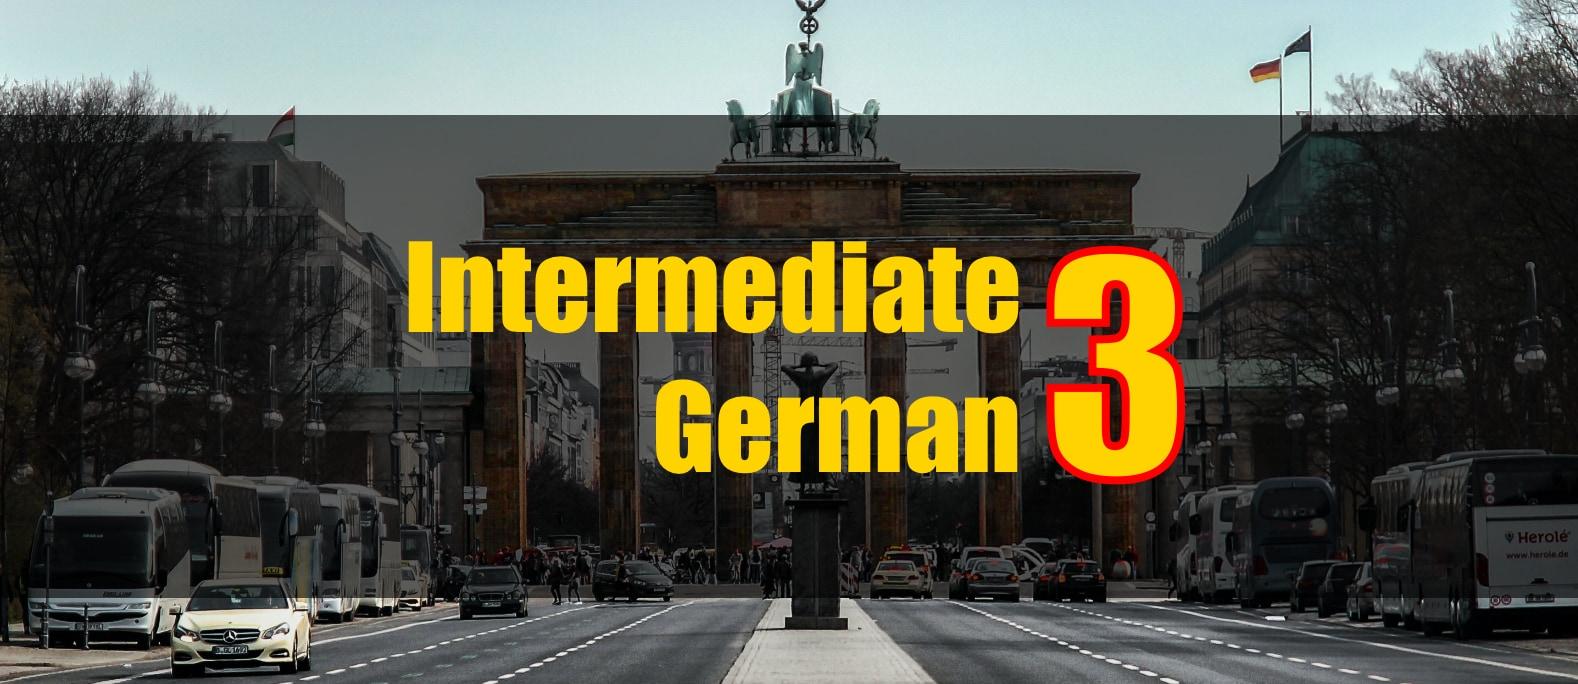 Intermediate German 3